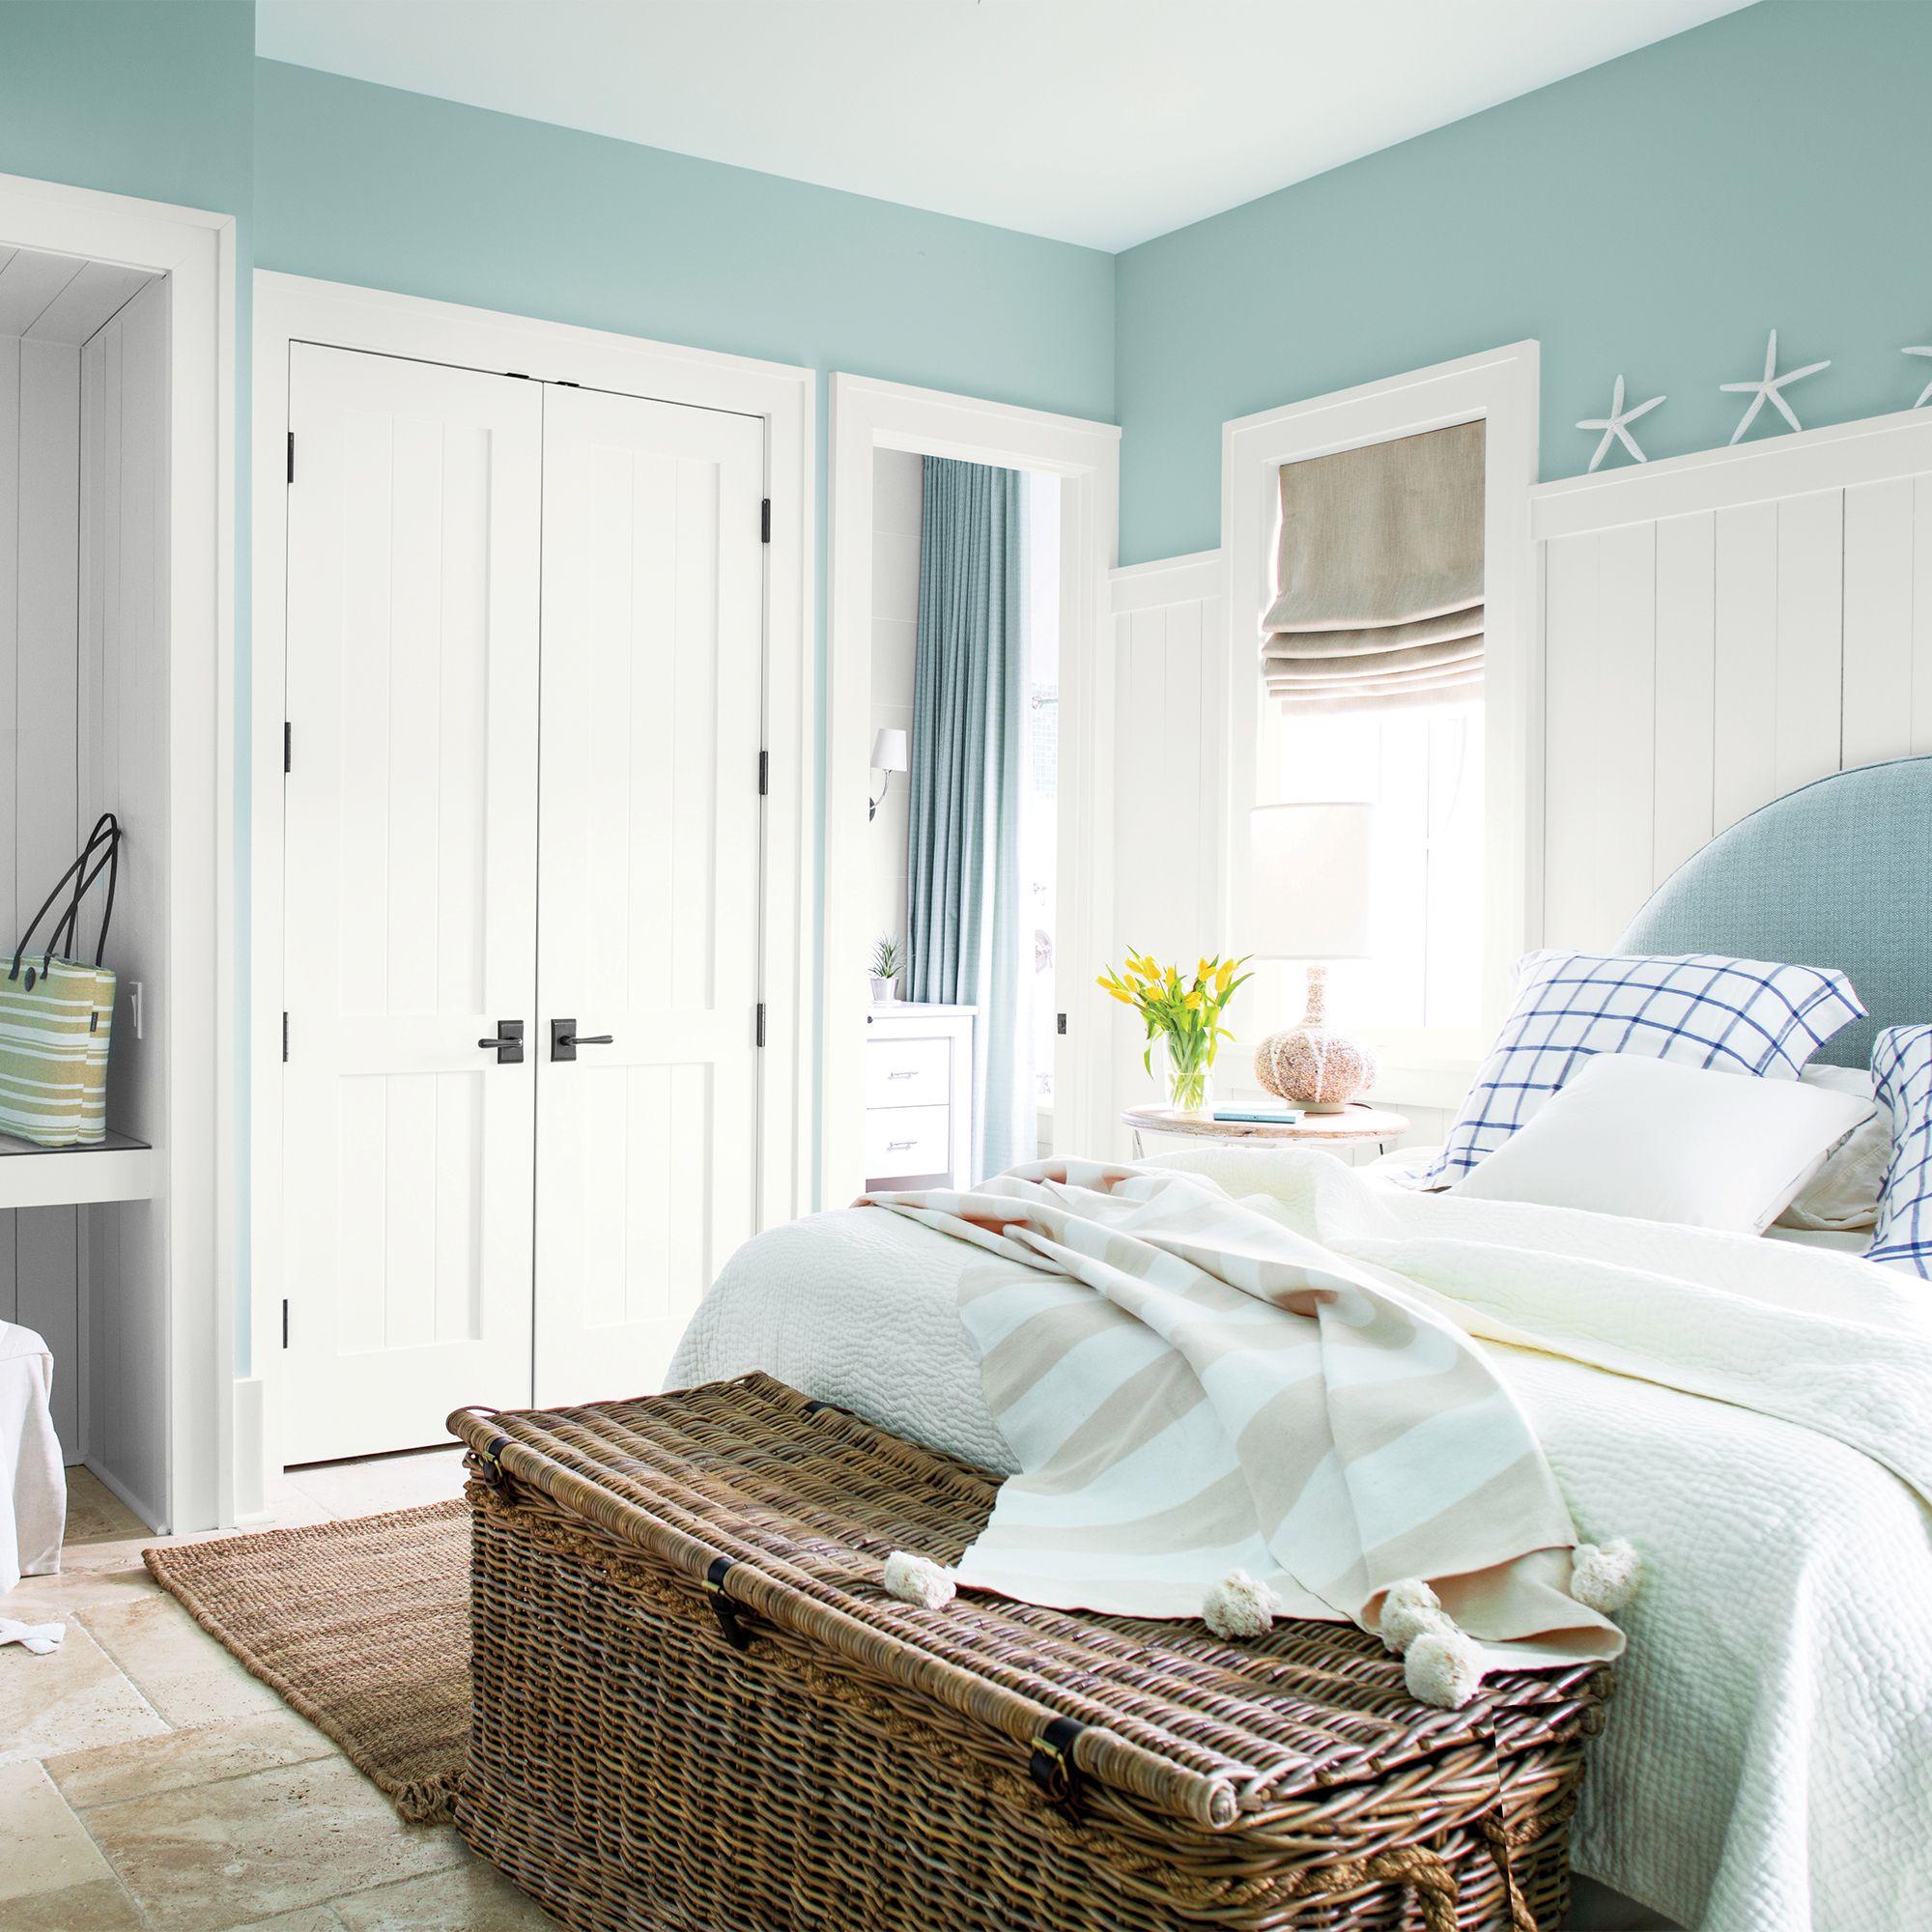 Light Blue Bedroom with Wicker Basket